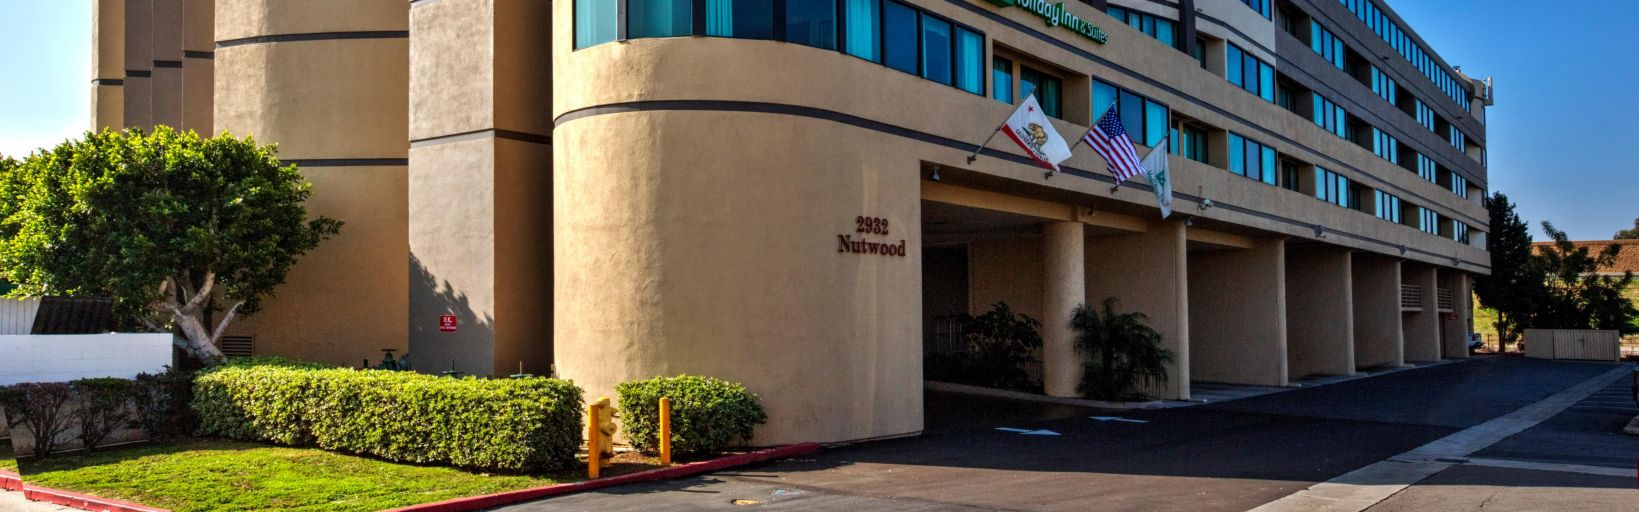 Holiday Inn Suites Near Anaheim Fullerton